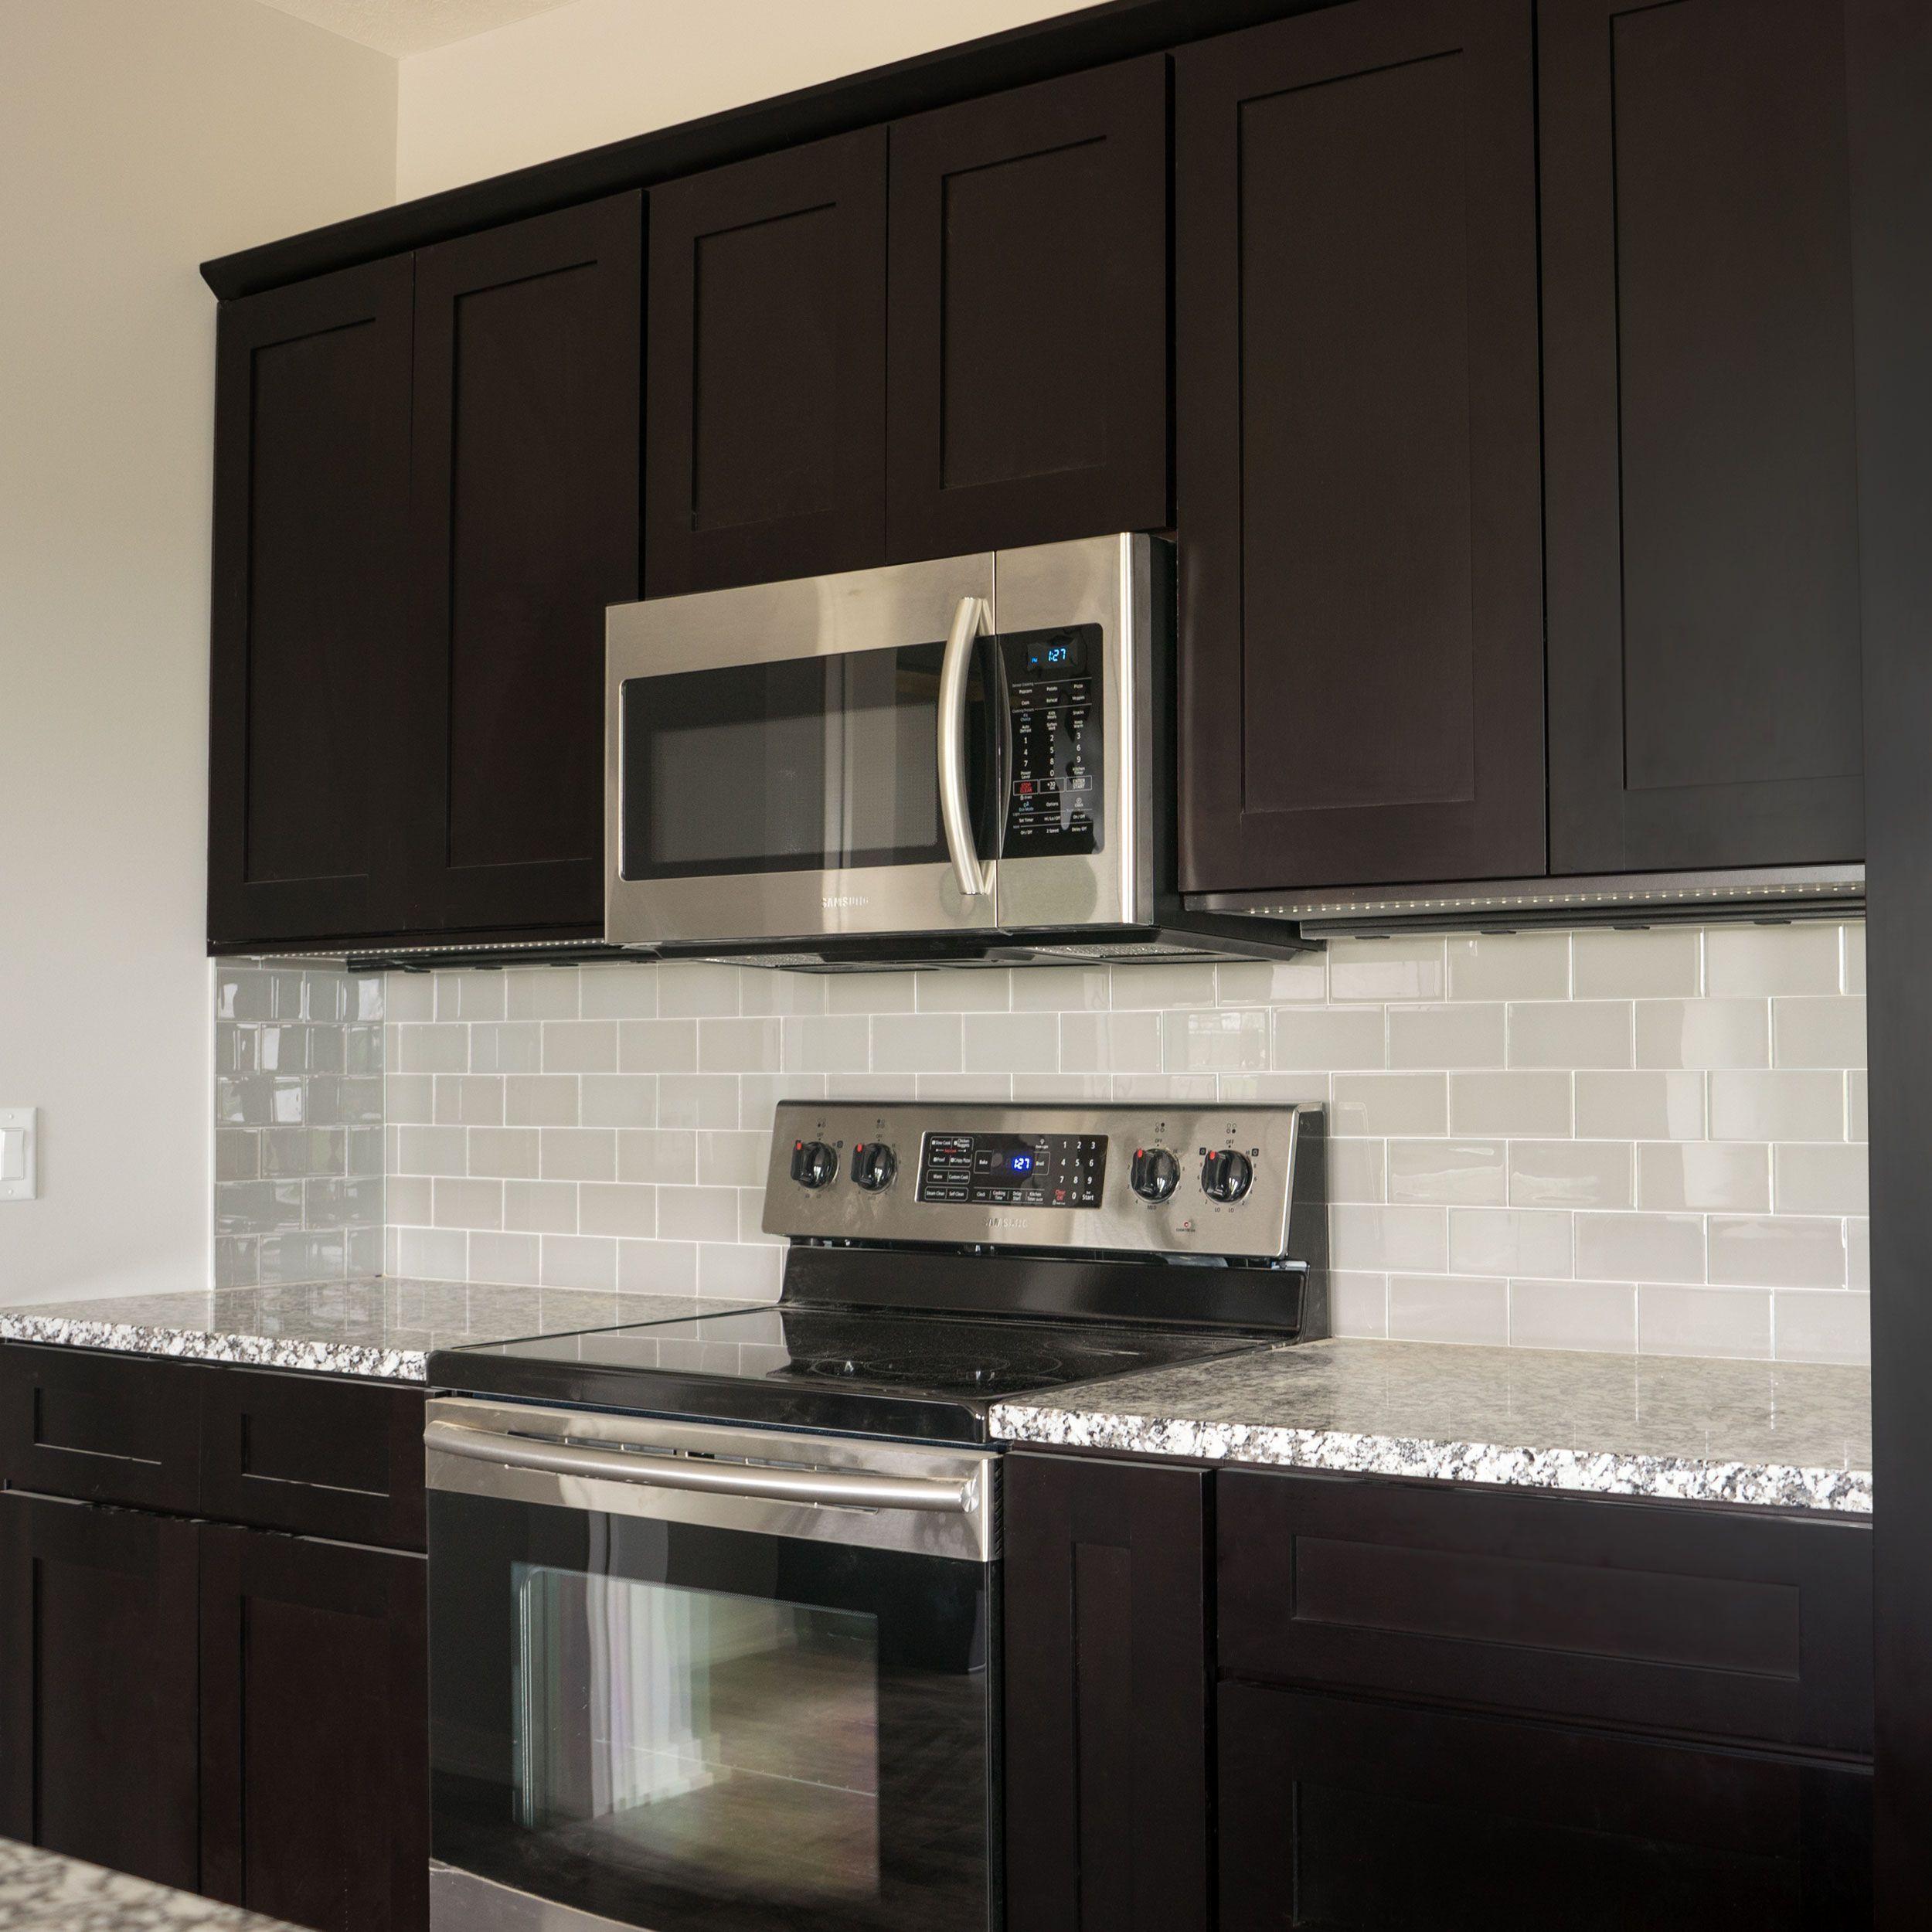 Joe If We Do Dark Cabinets I Don T Think The Gray Engineered